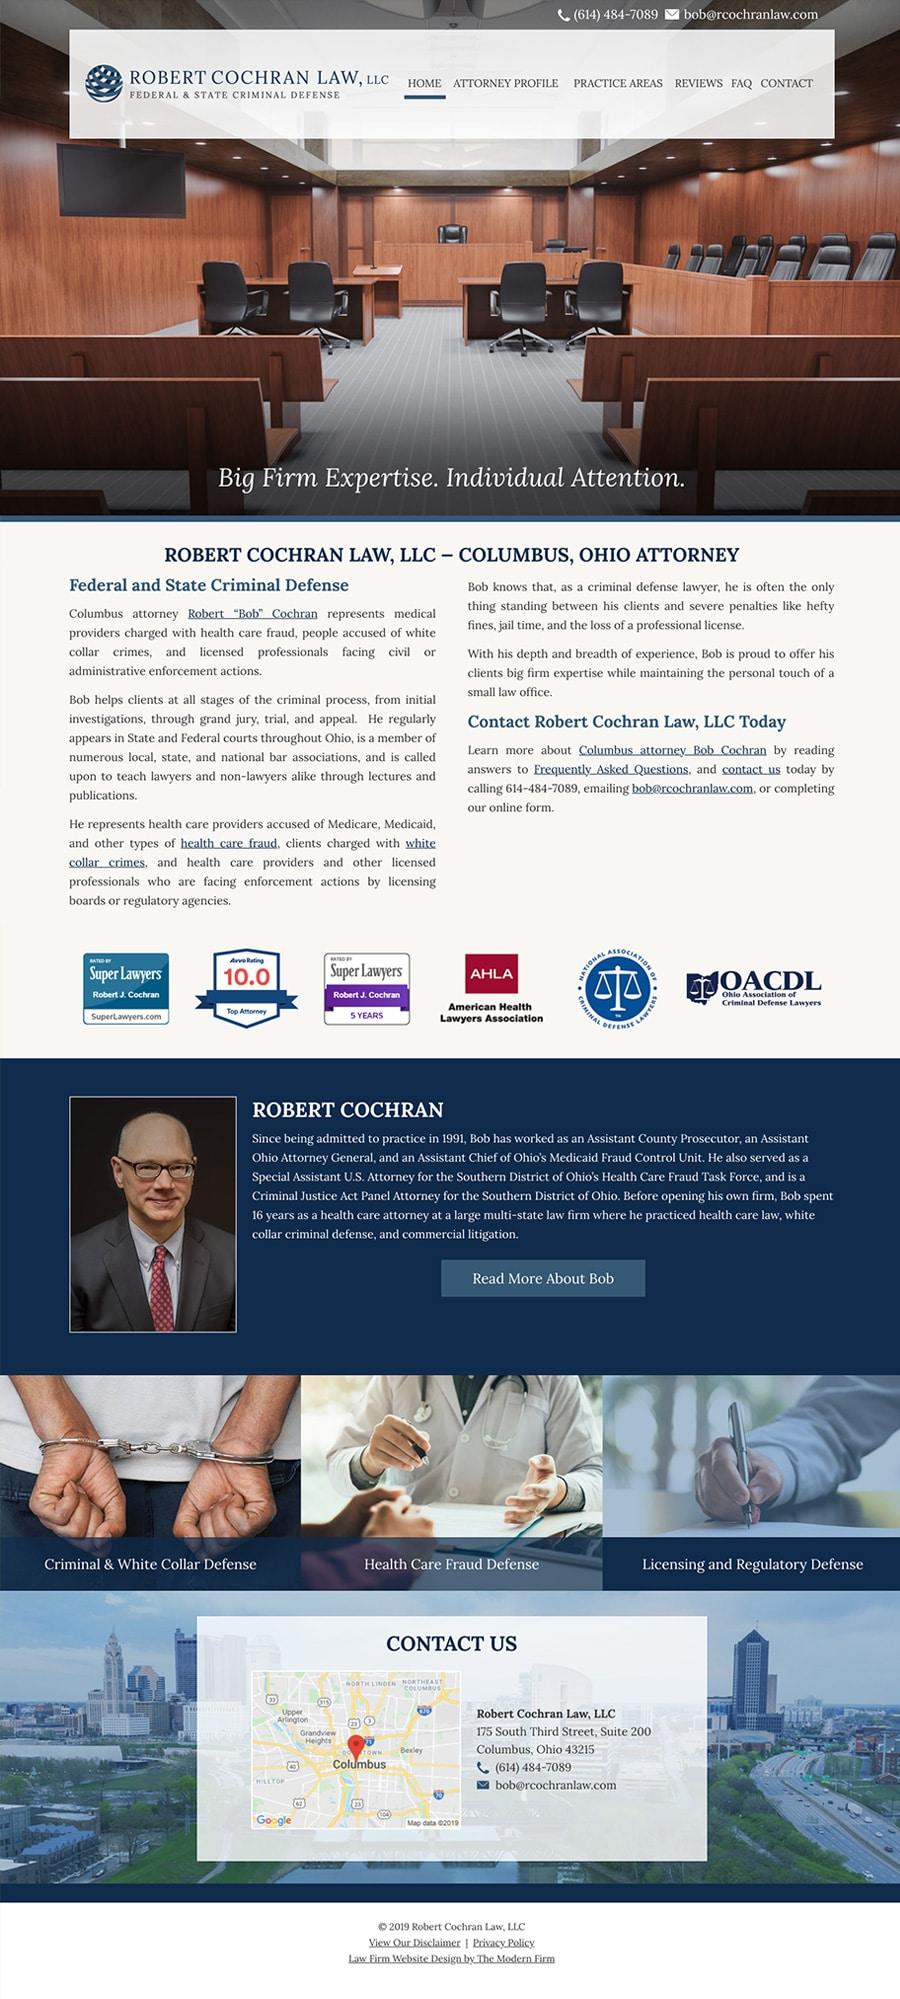 Law Firm Website Design for Robert Cochran Law, LLC